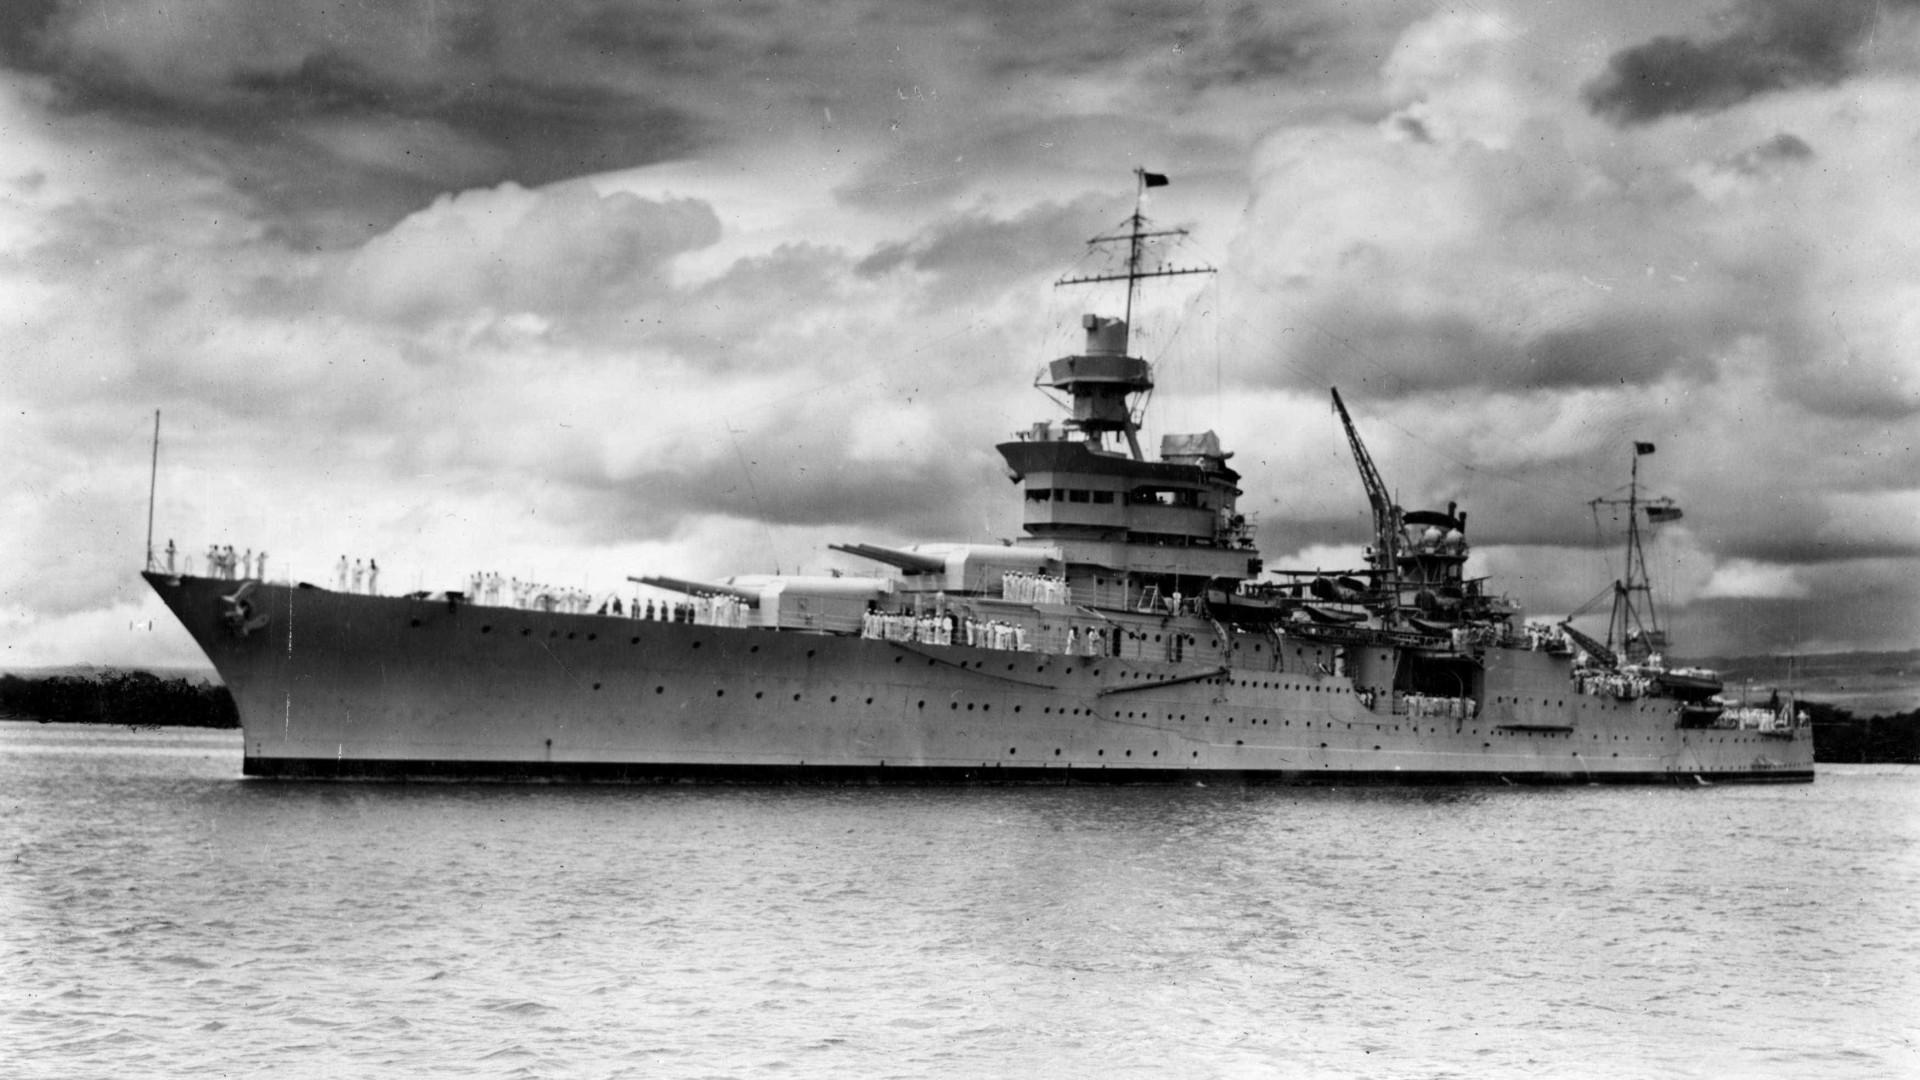 Encontrados destroços do USS Indianapolis, afundado na II Guerra Mundial